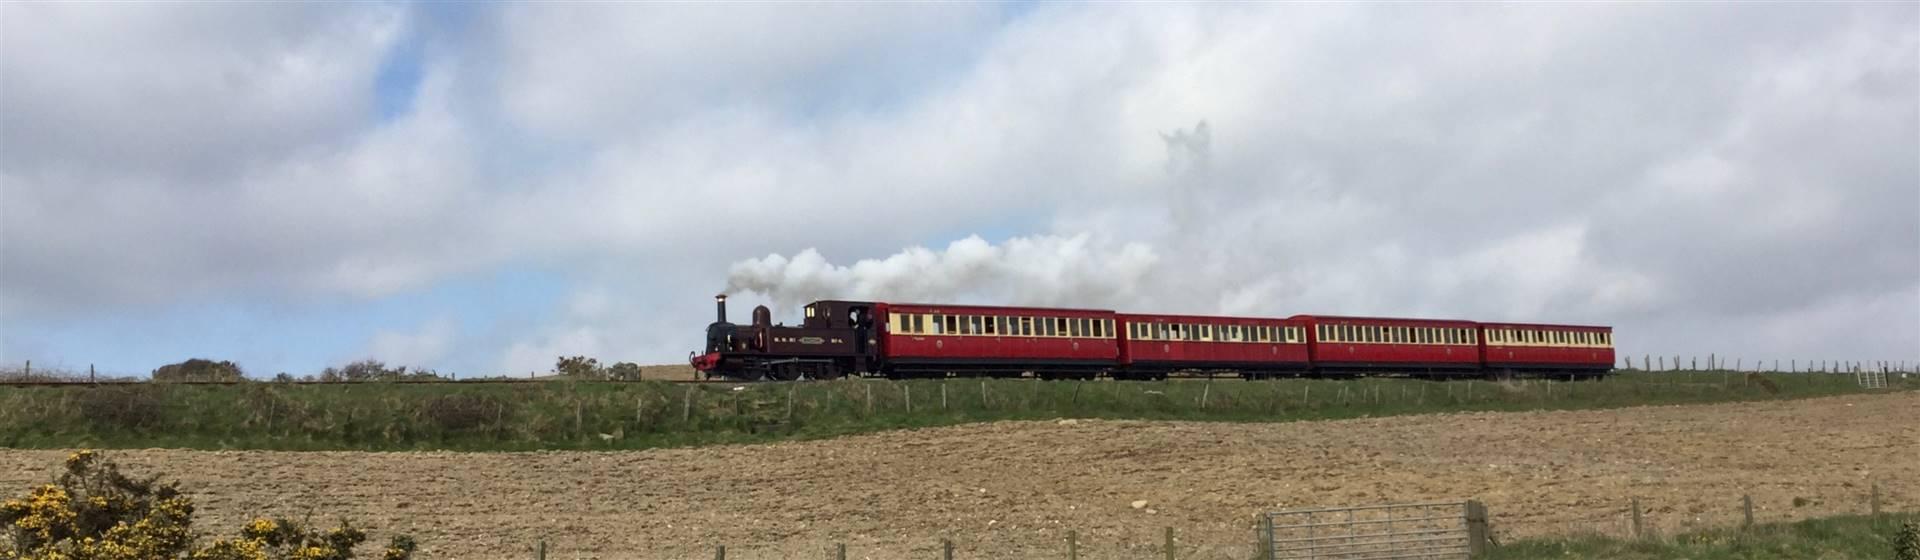 "<img src=""isleofmansteamtrain-shutterstock_1362854093.jpeg"" alt=""Isle of Man Steam Explorer""/>"